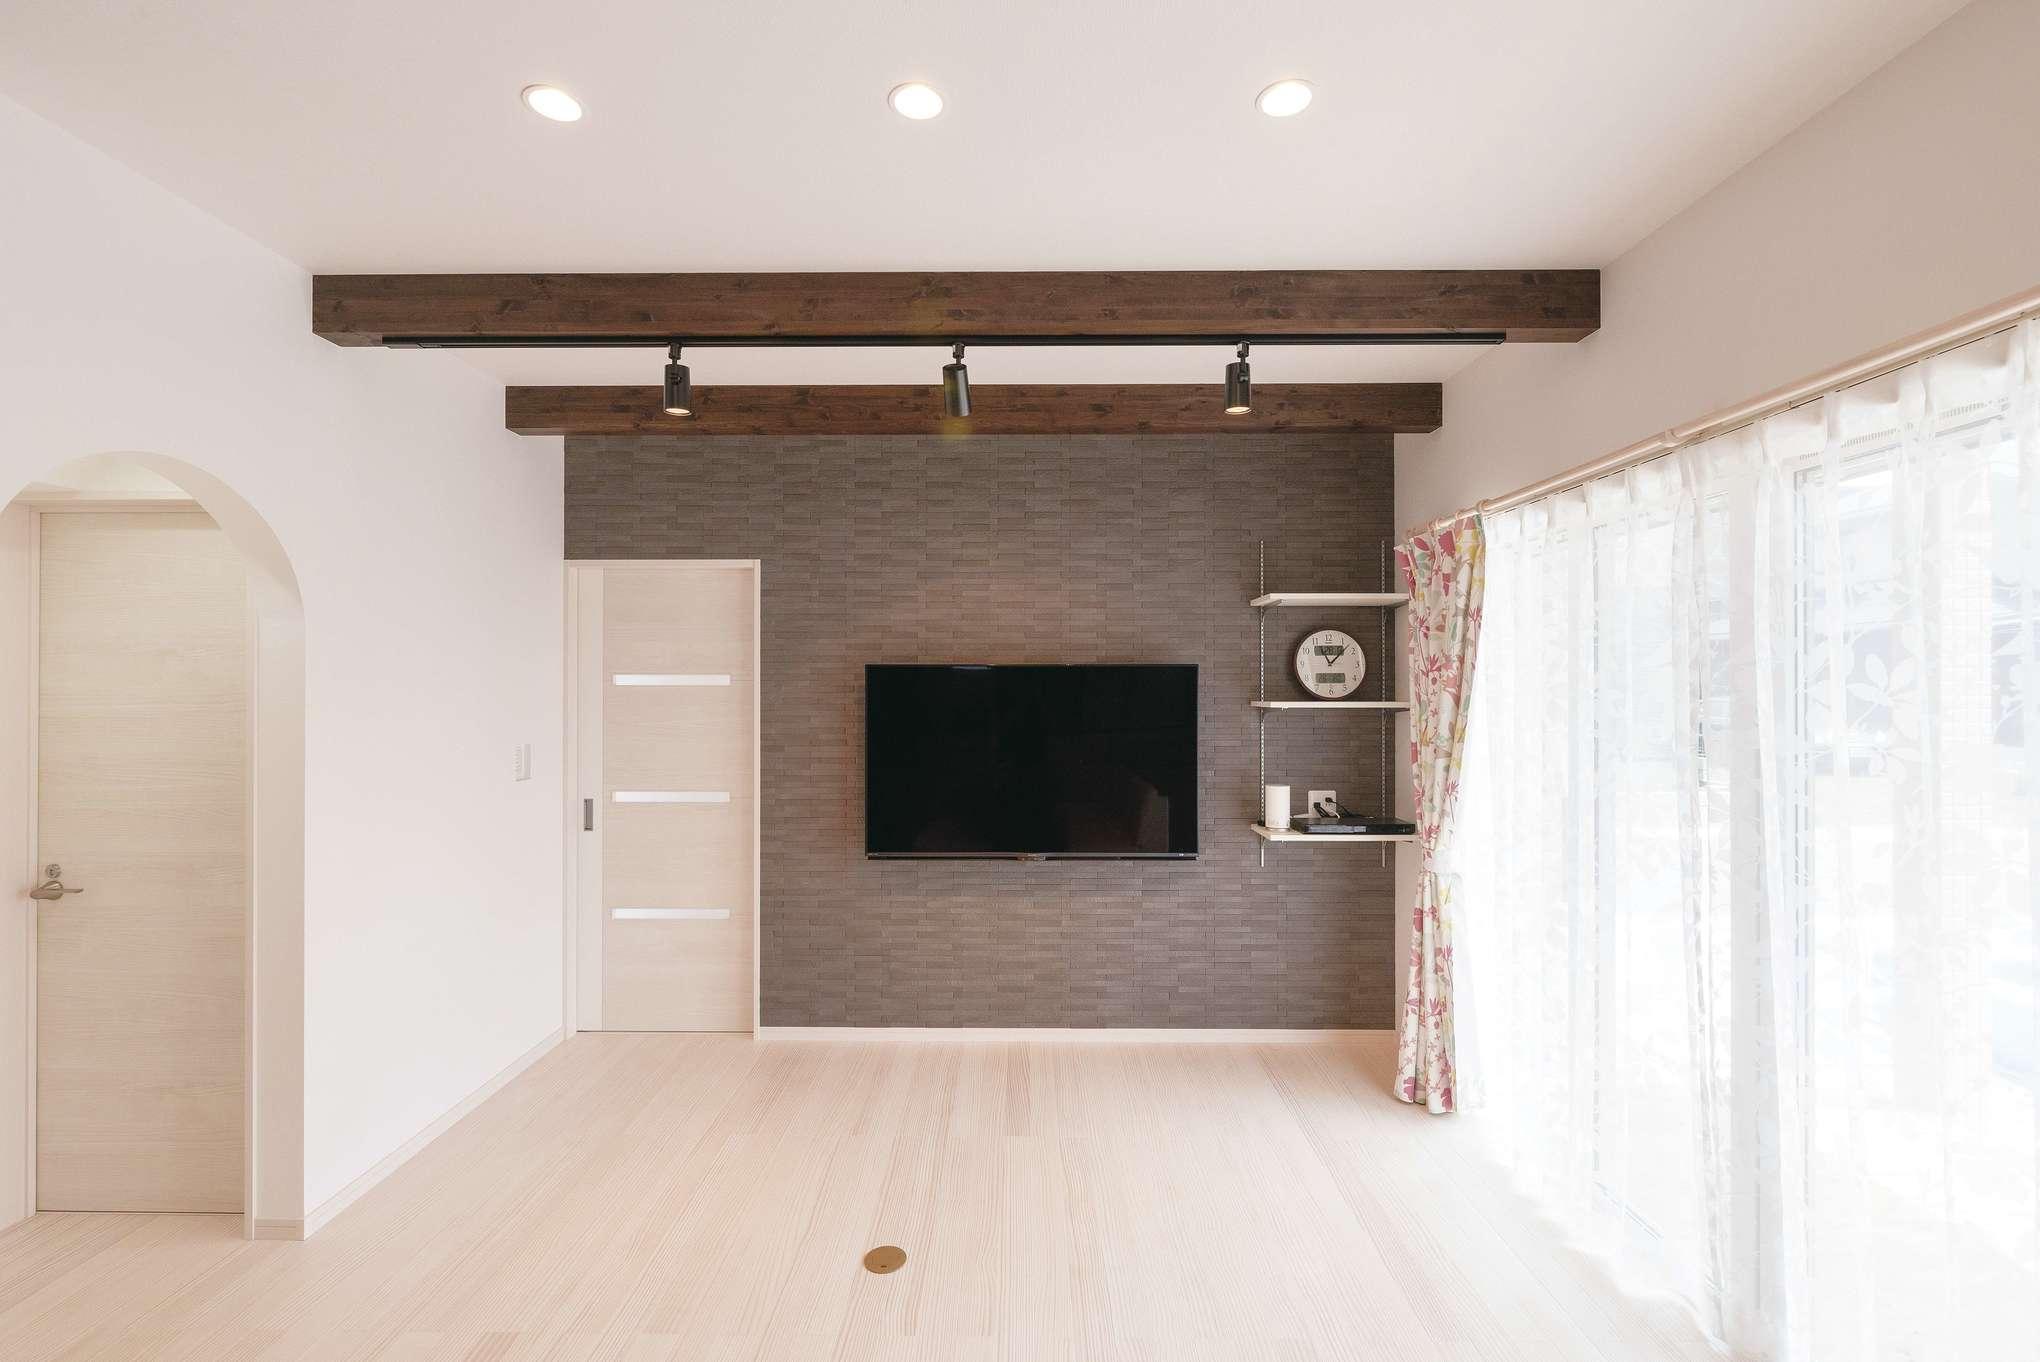 R+house沼津・伊東(HOUSE PLAN)【子育て、収納力、間取り】テレビを設置した壁一面に、エコカラットを貼った